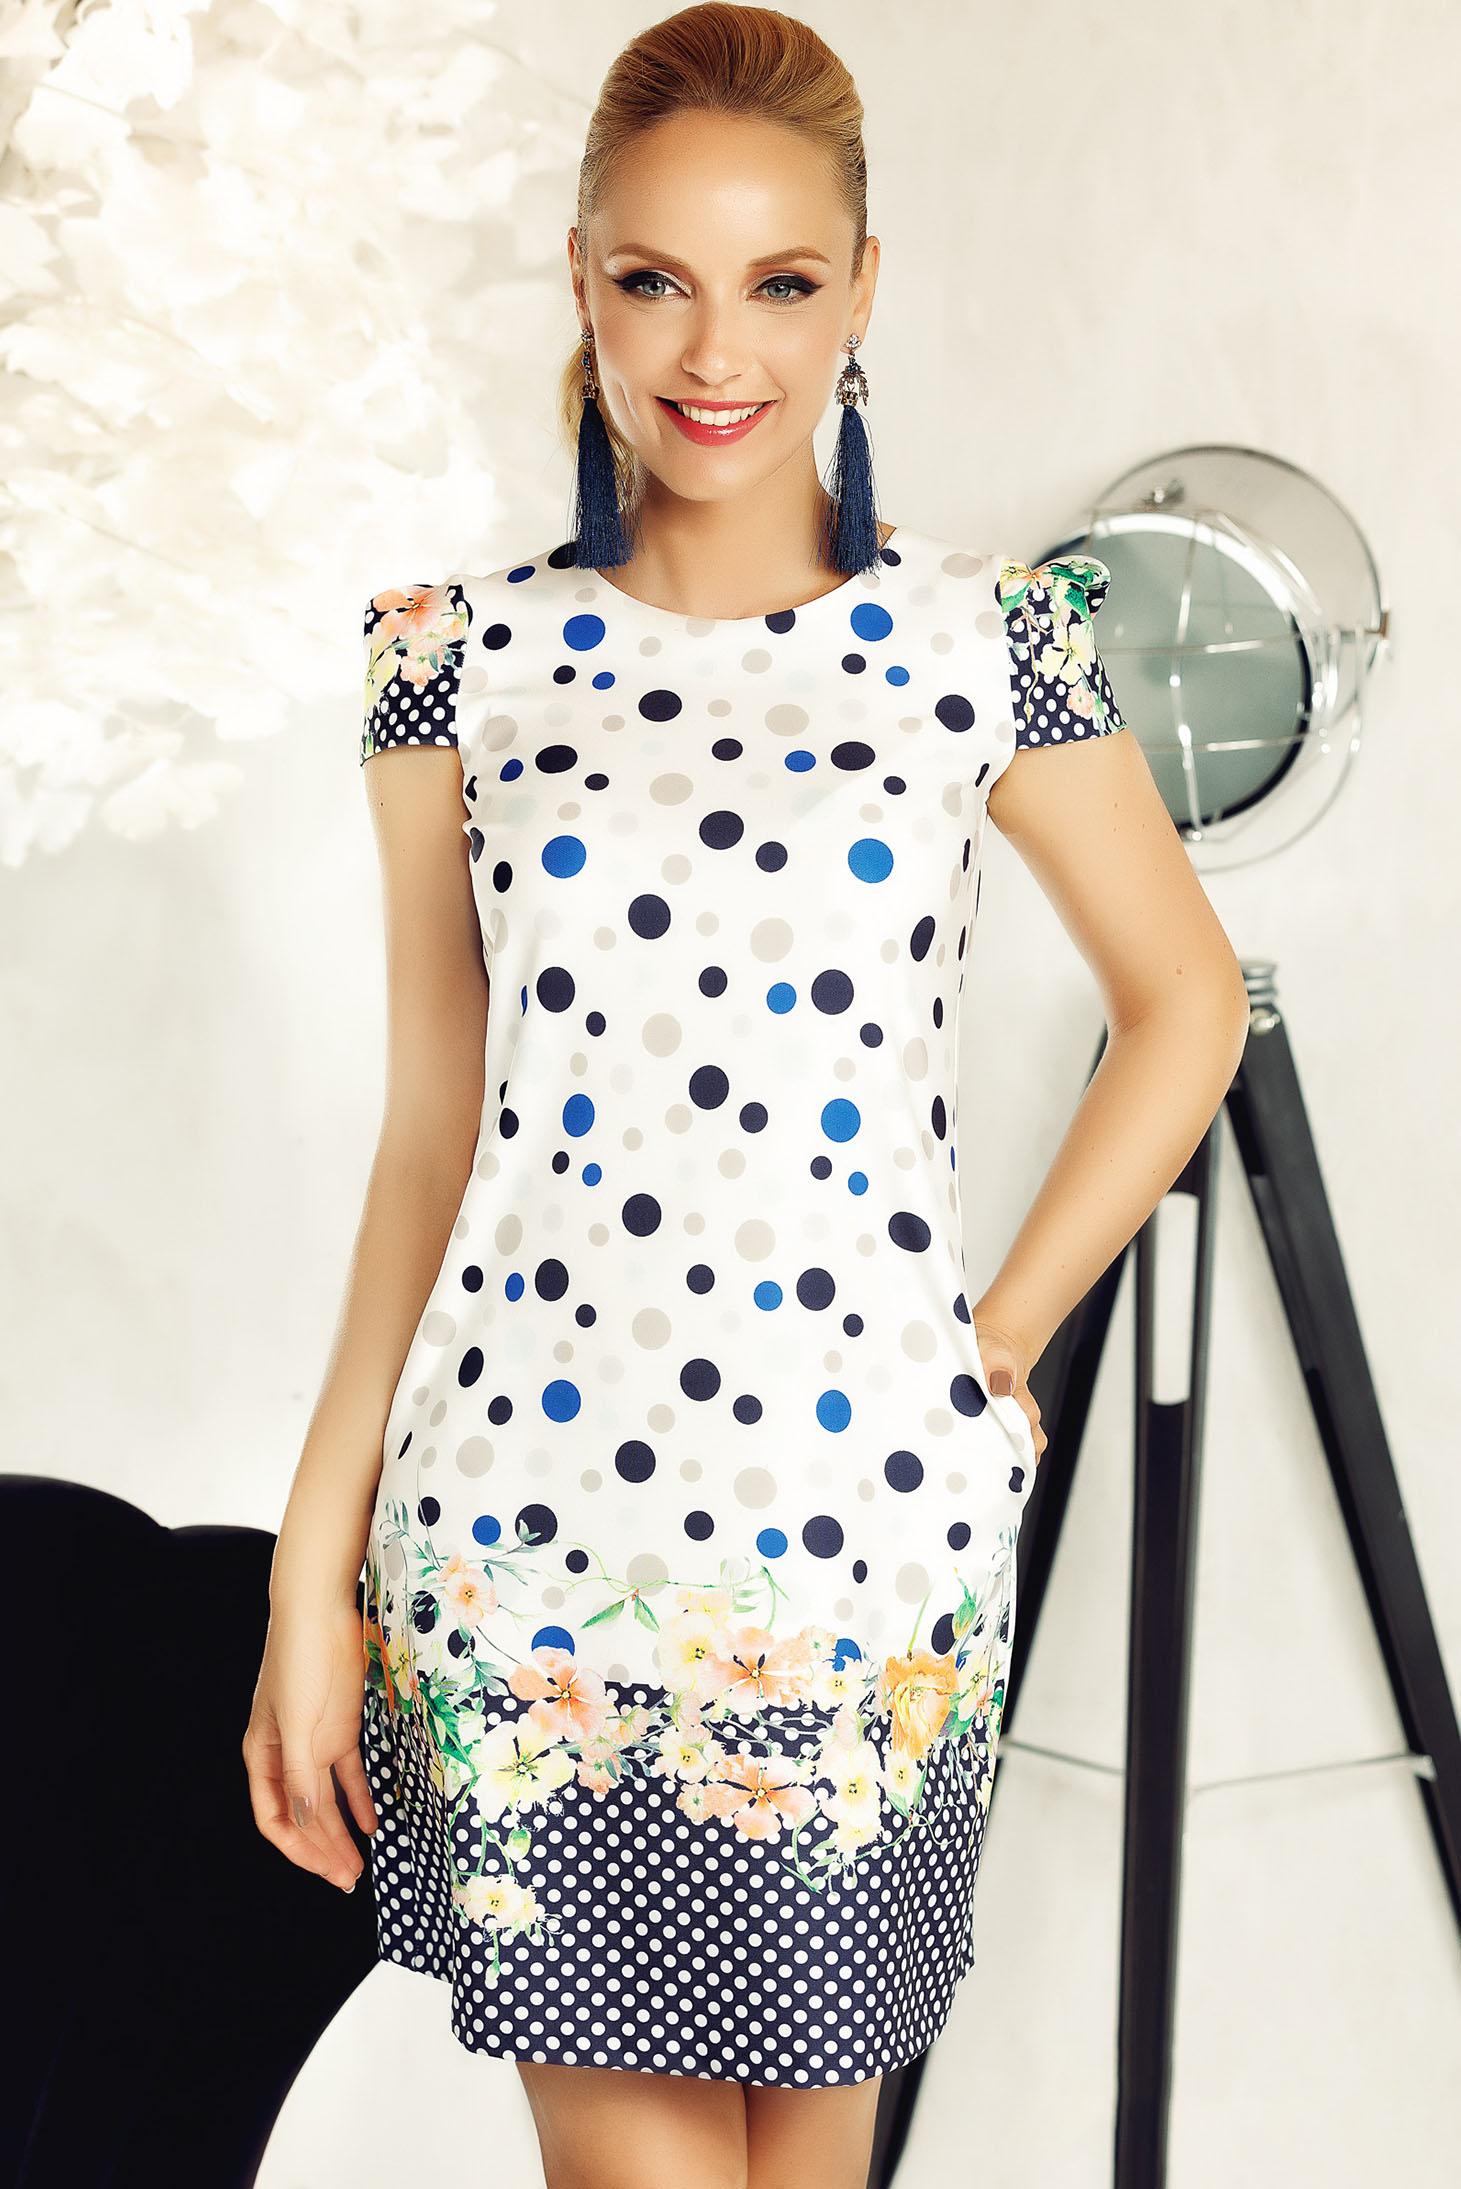 dc98408fd289 fofy-white-office-a-line-dress-slightly-elastic-fa-S036898-1-360413.jpg